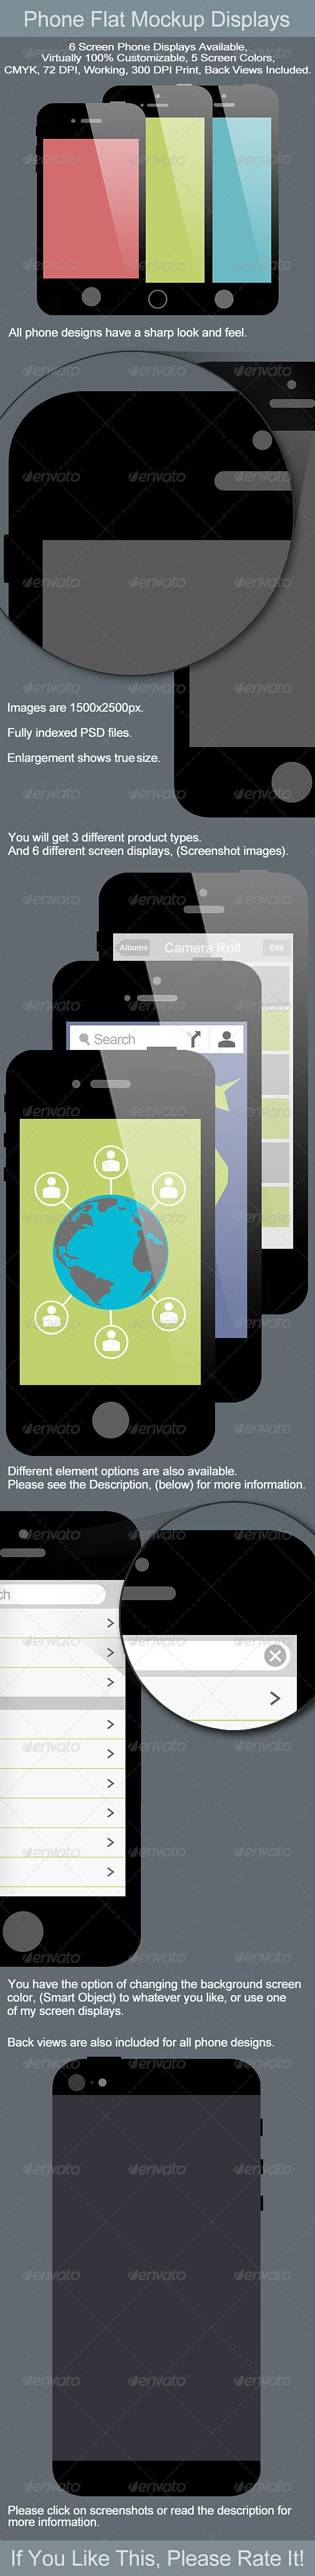 Phone 4 5 and 5s Flat Mockup Displays